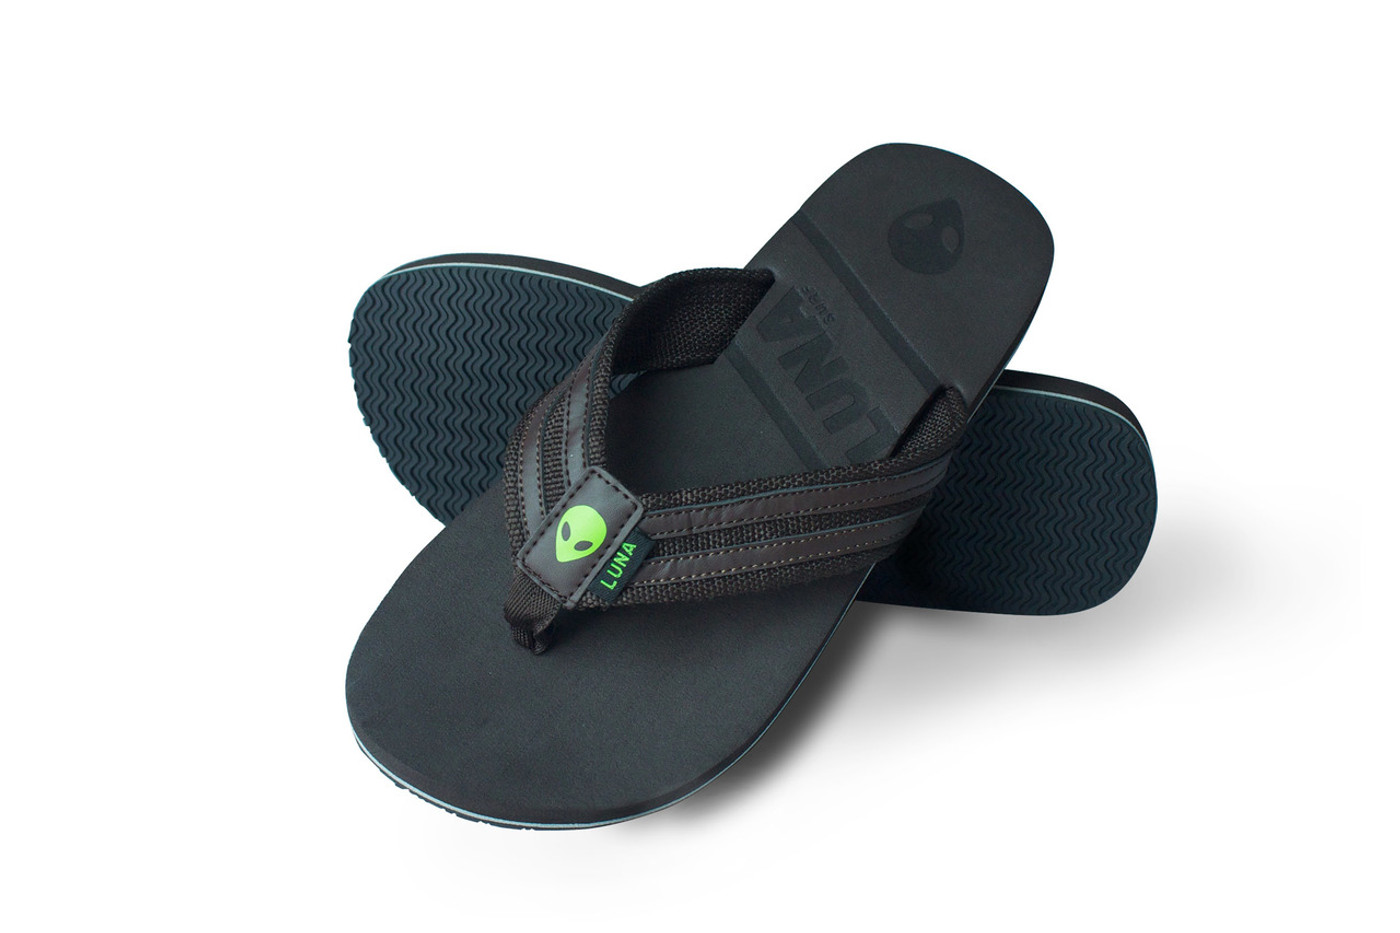 Lunasurf Brown Flip Flops